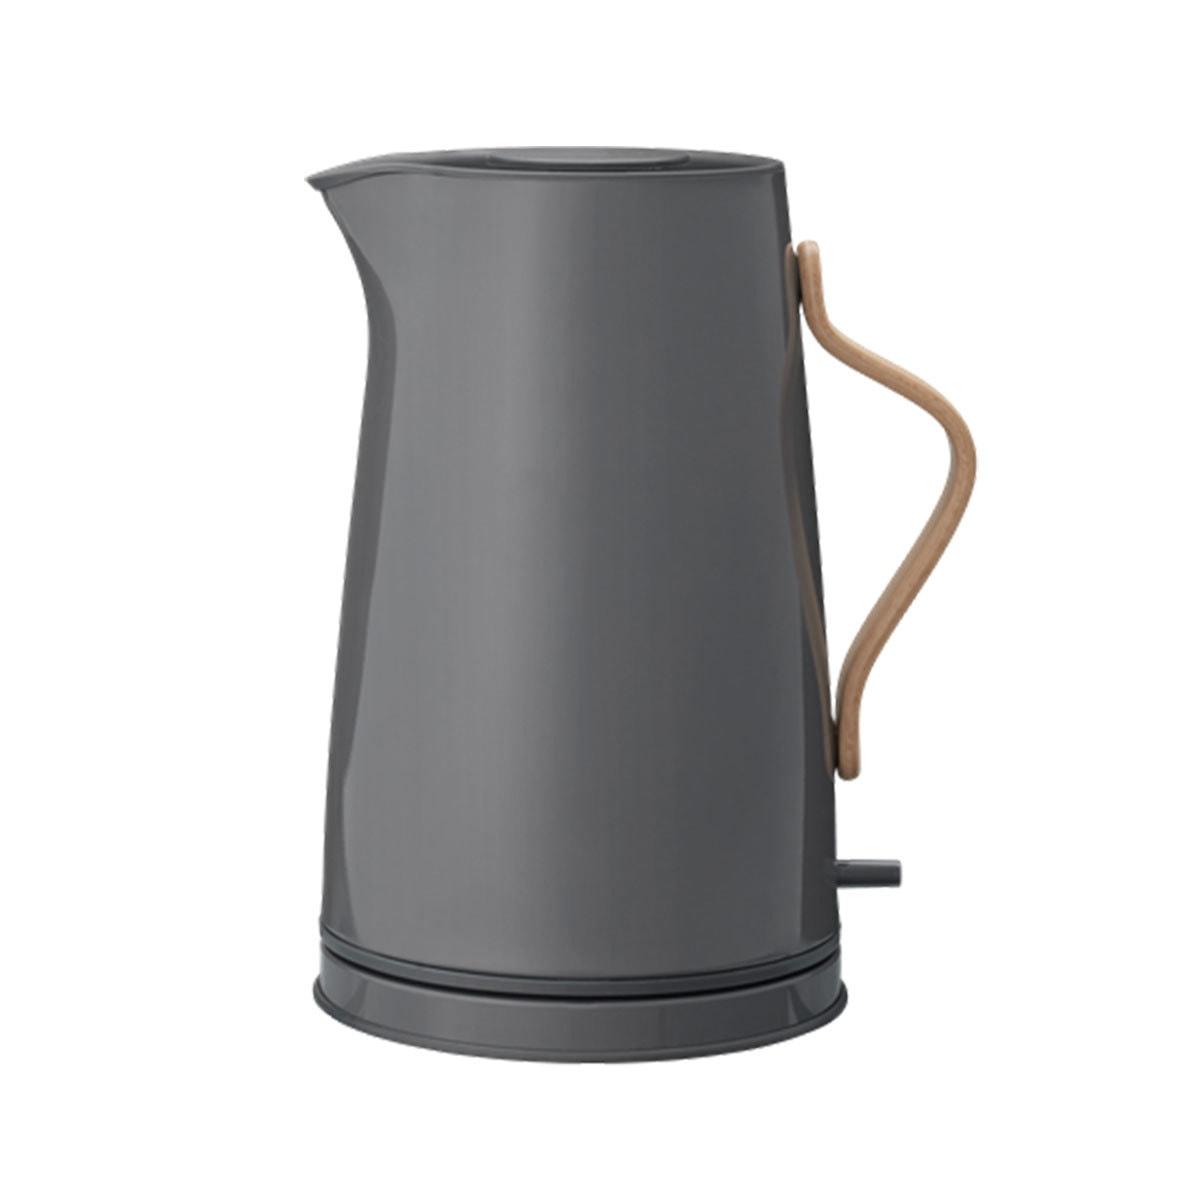 stelton emma wasserkocher grau 1 2 l wasserkocher kochen essen livingtools design. Black Bedroom Furniture Sets. Home Design Ideas